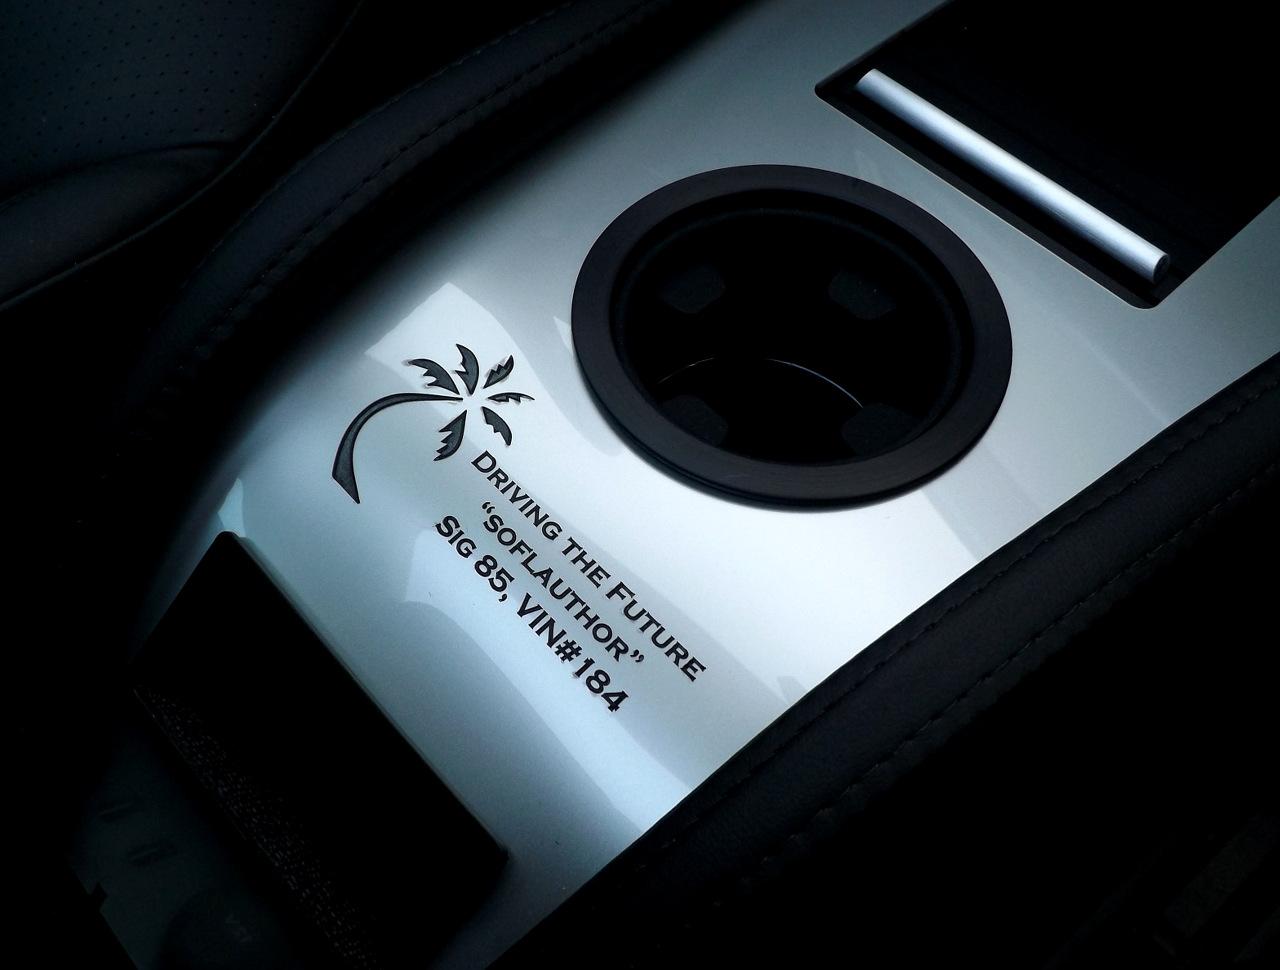 Personalized-Tesla-Center-Console-CCI-3